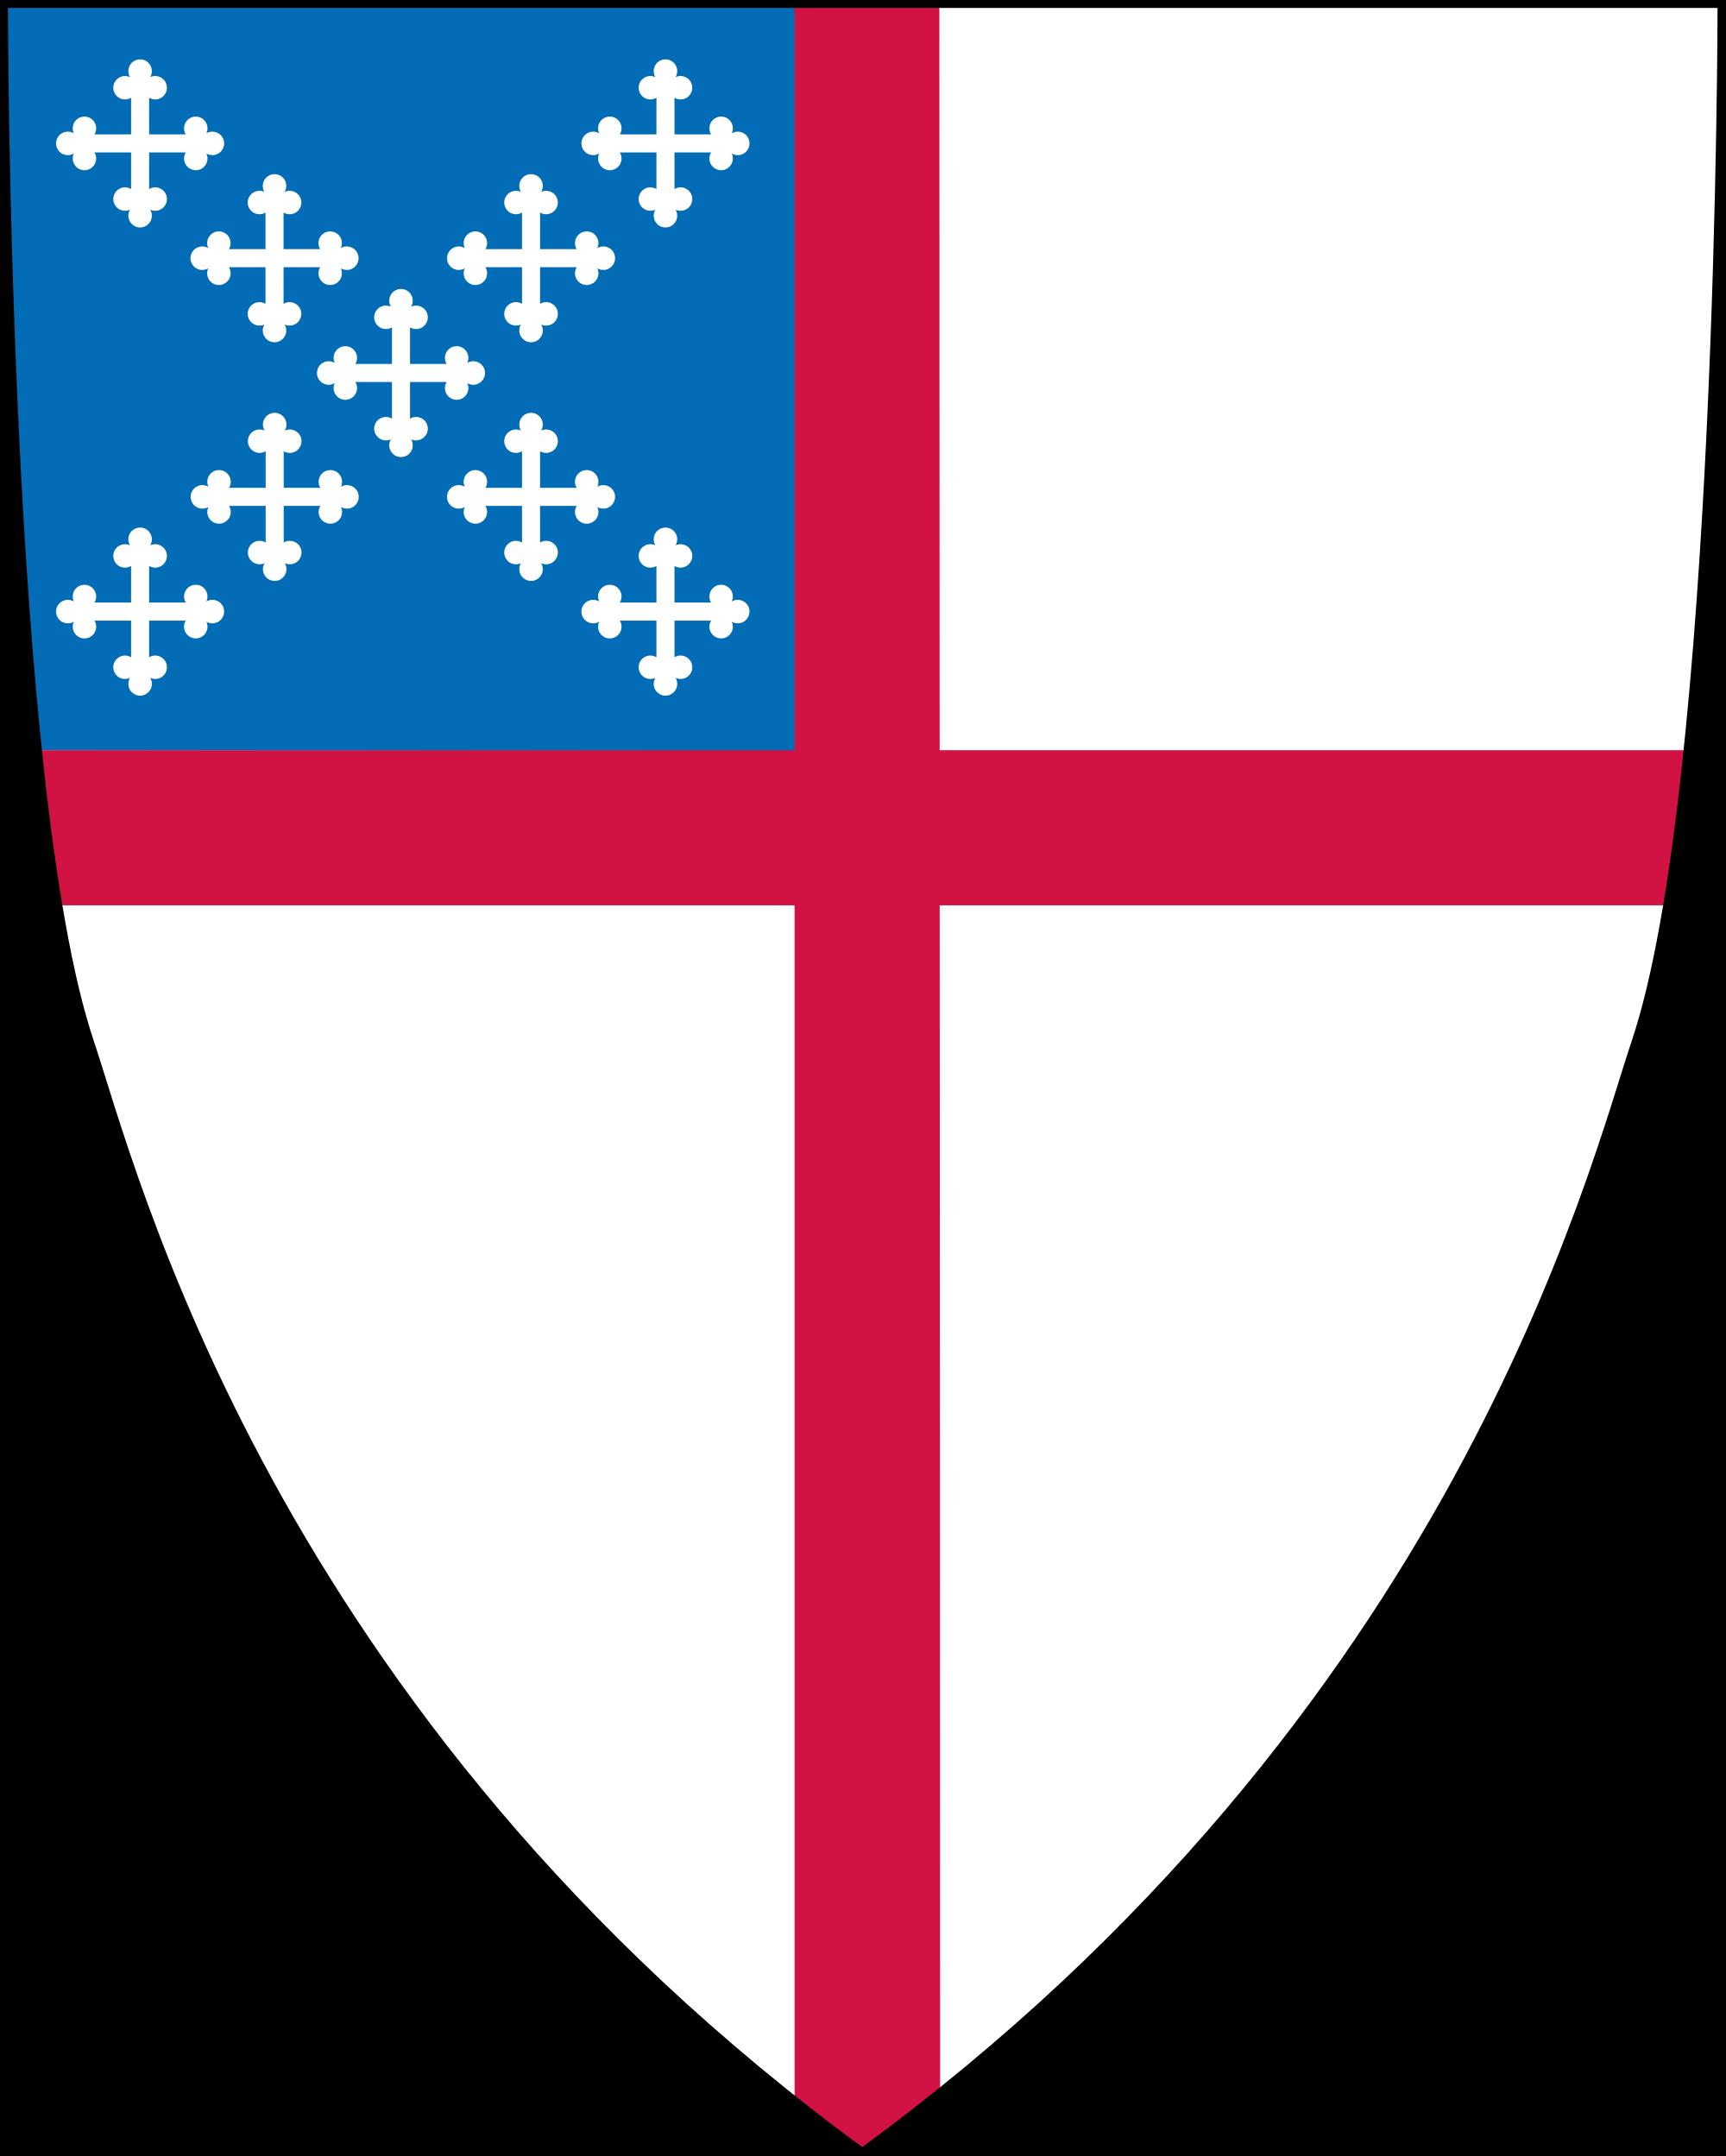 The episcopal church trinity. Clipart shield public domain